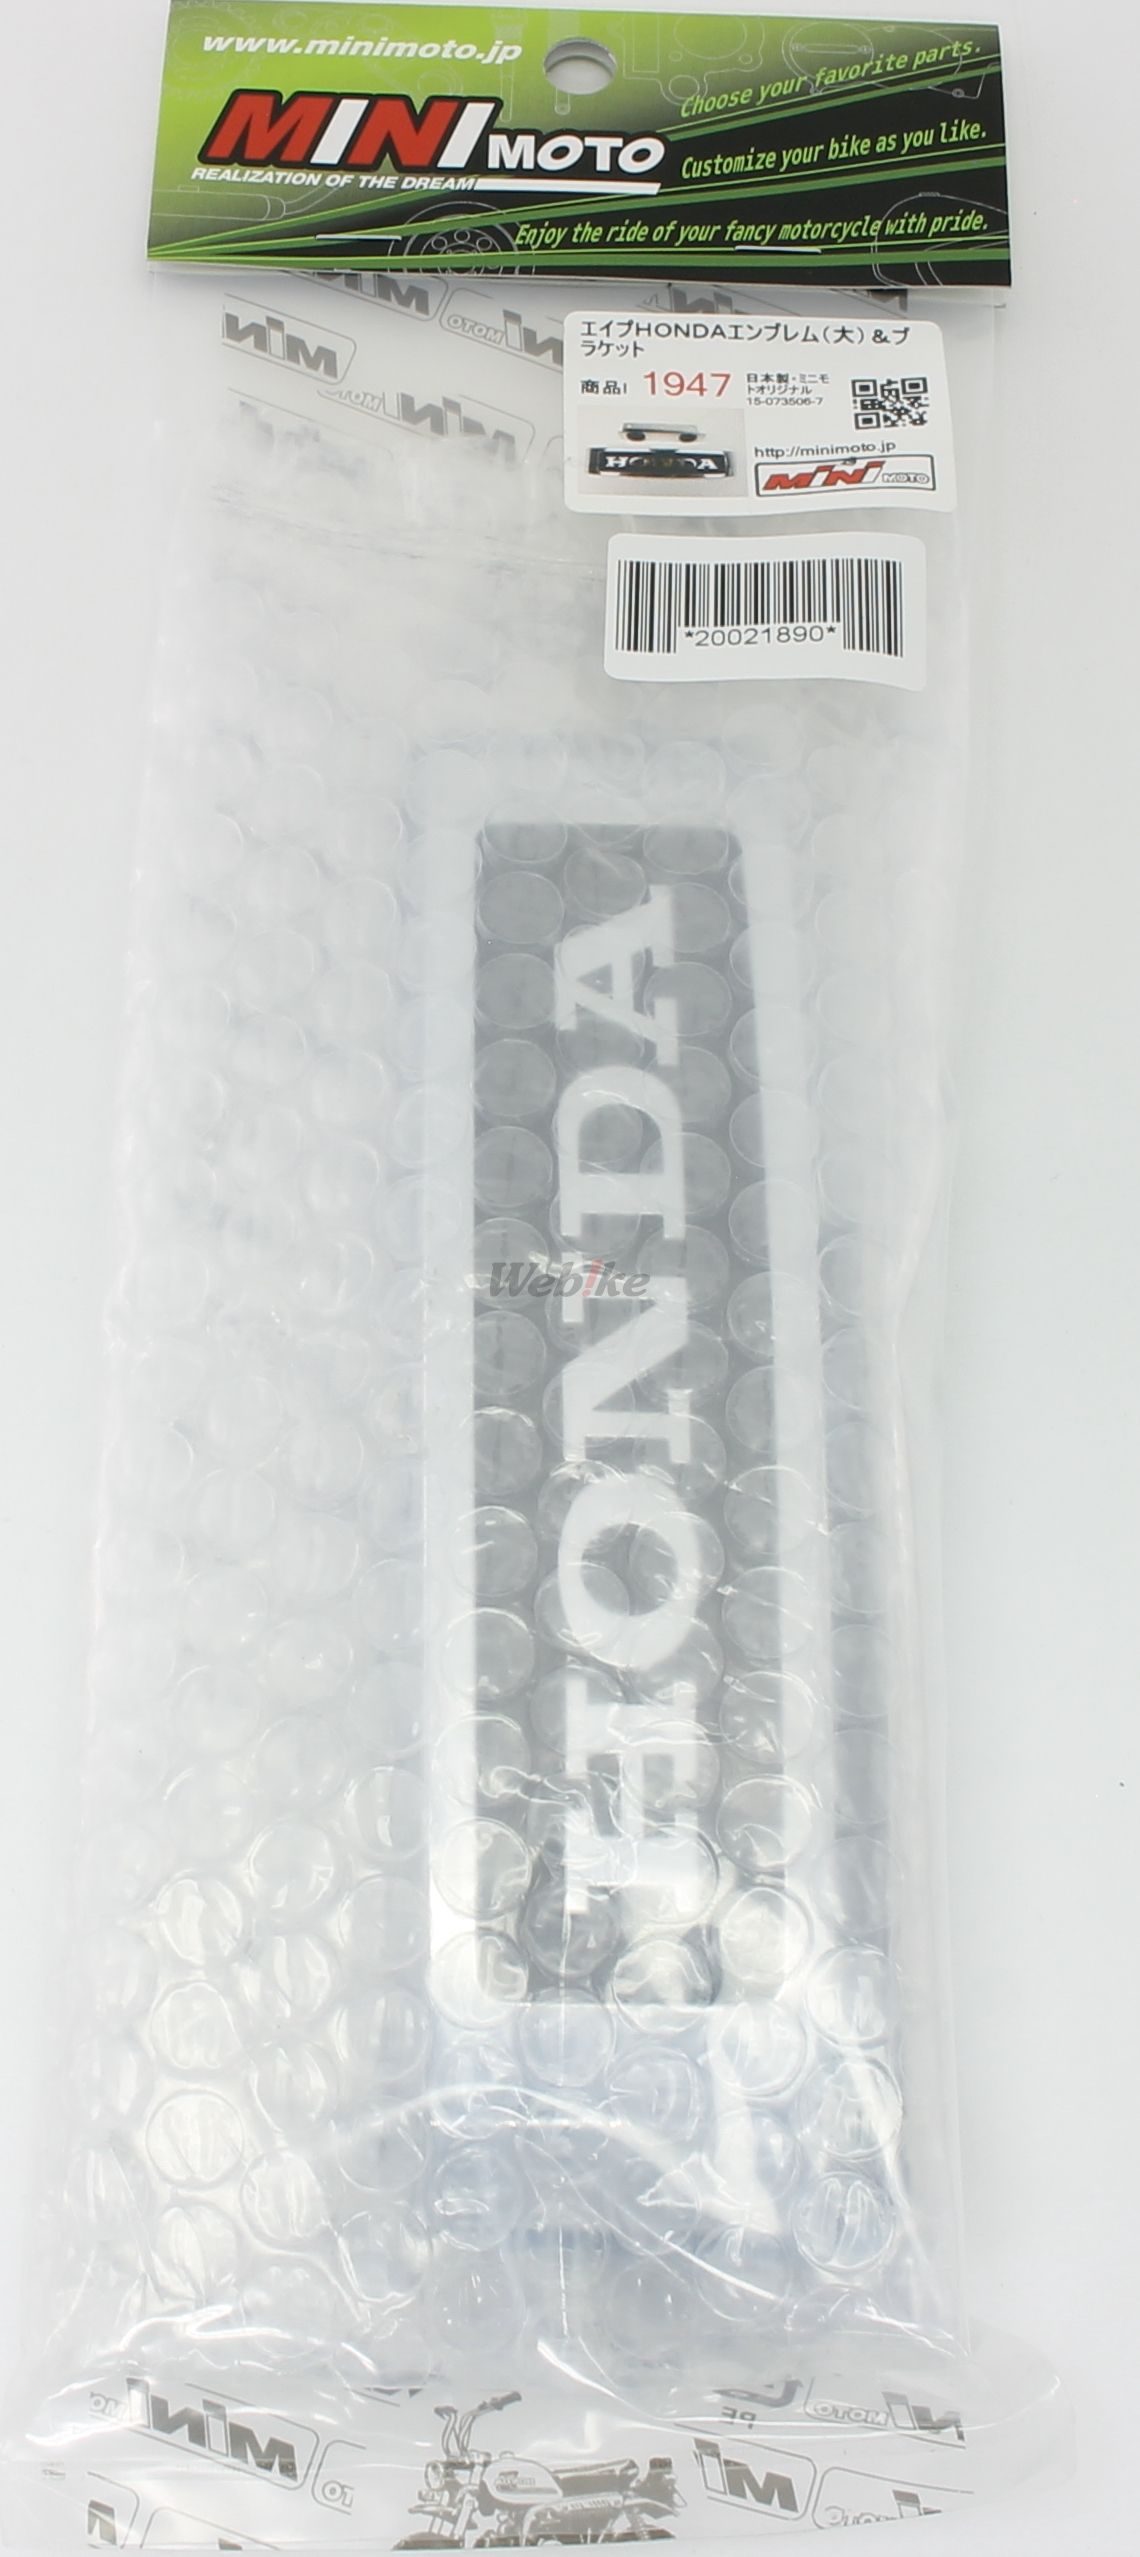 【MINIMOTO】APE HONDA銘板(大)&支架 - 「Webike-摩托百貨」